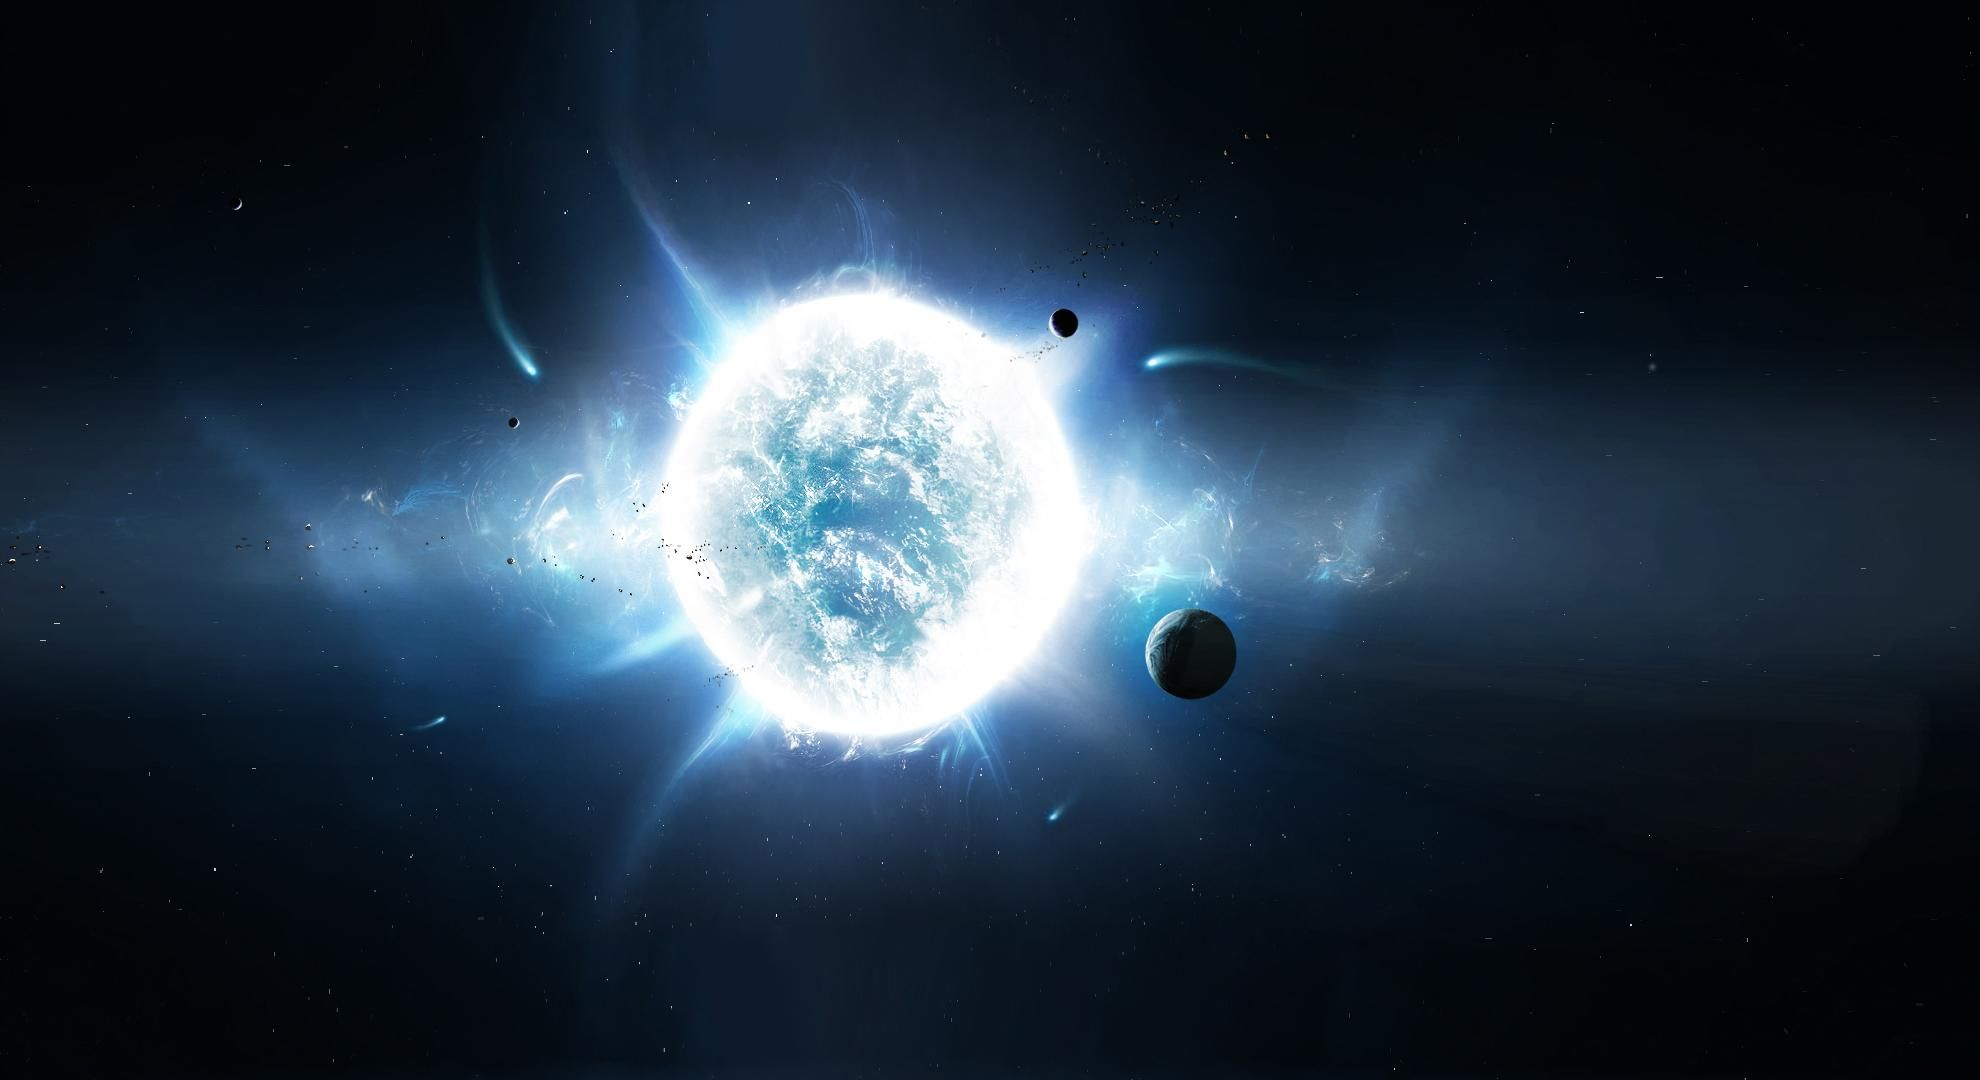 neutron star definition - HD1980×1080